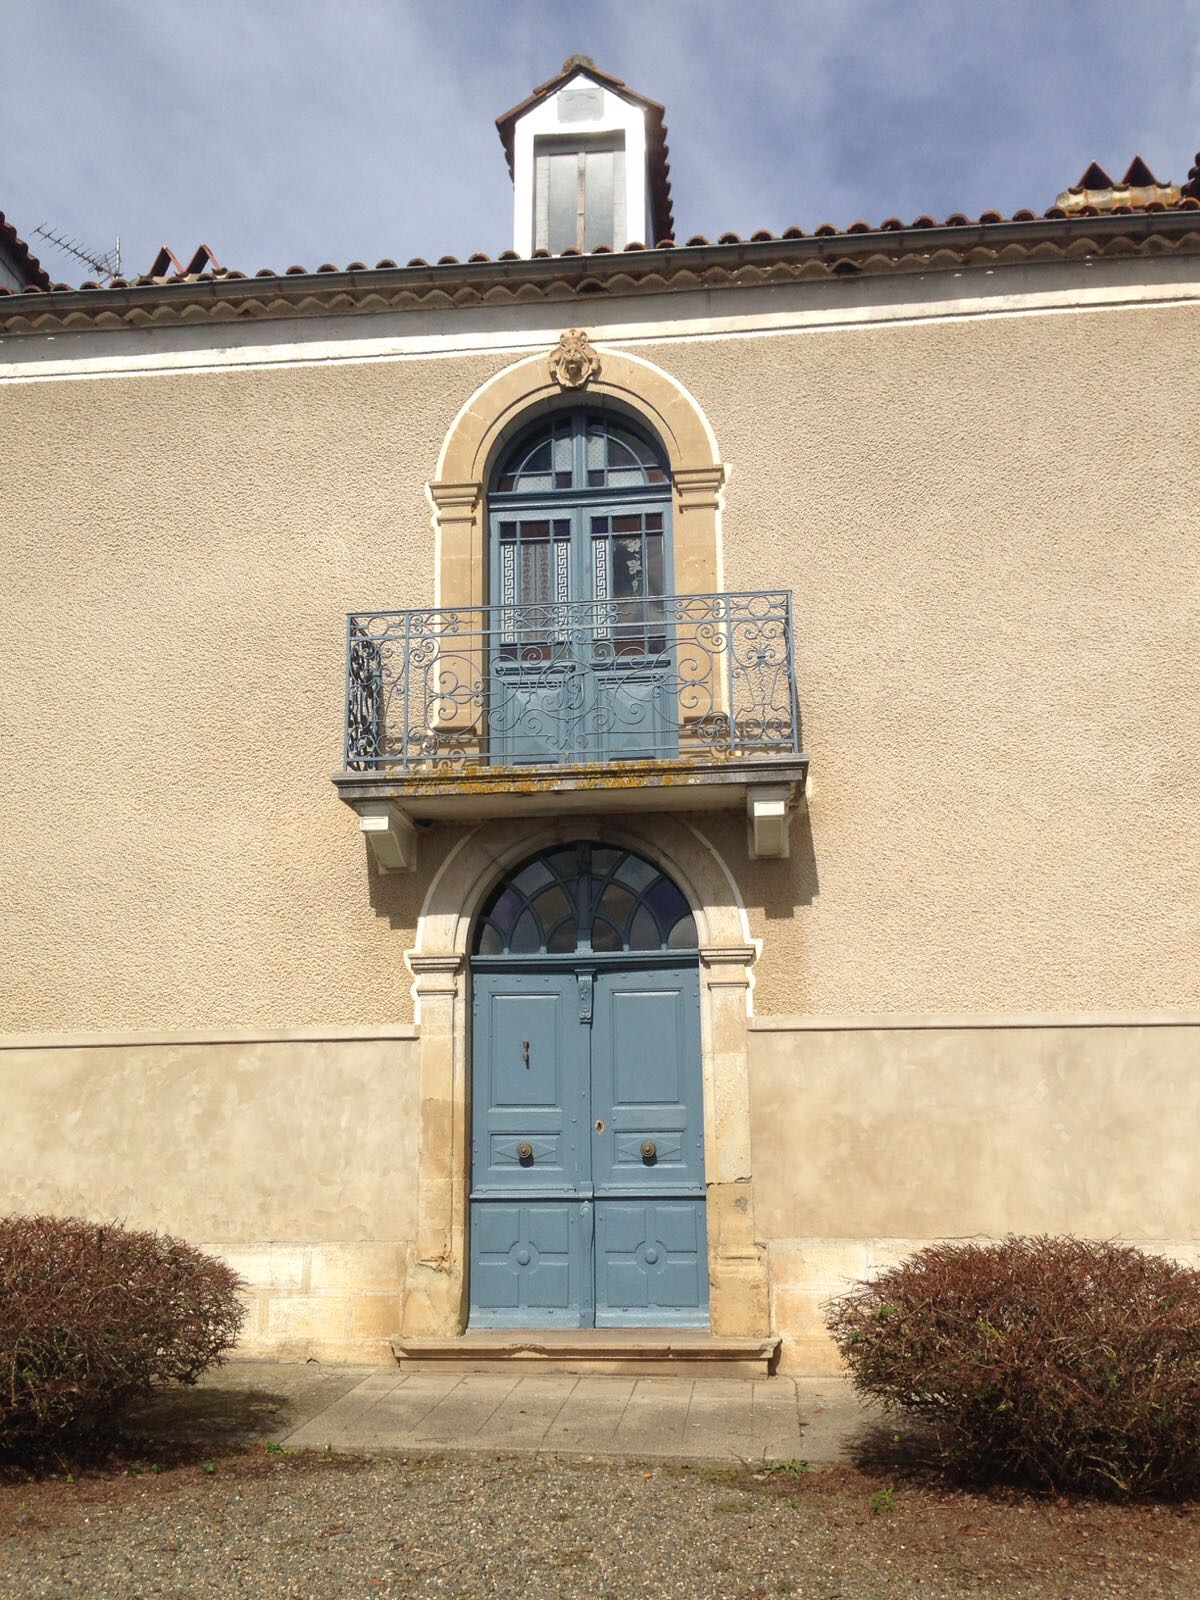 Property 12 | Domaine du Pignoulet, Gascony, France